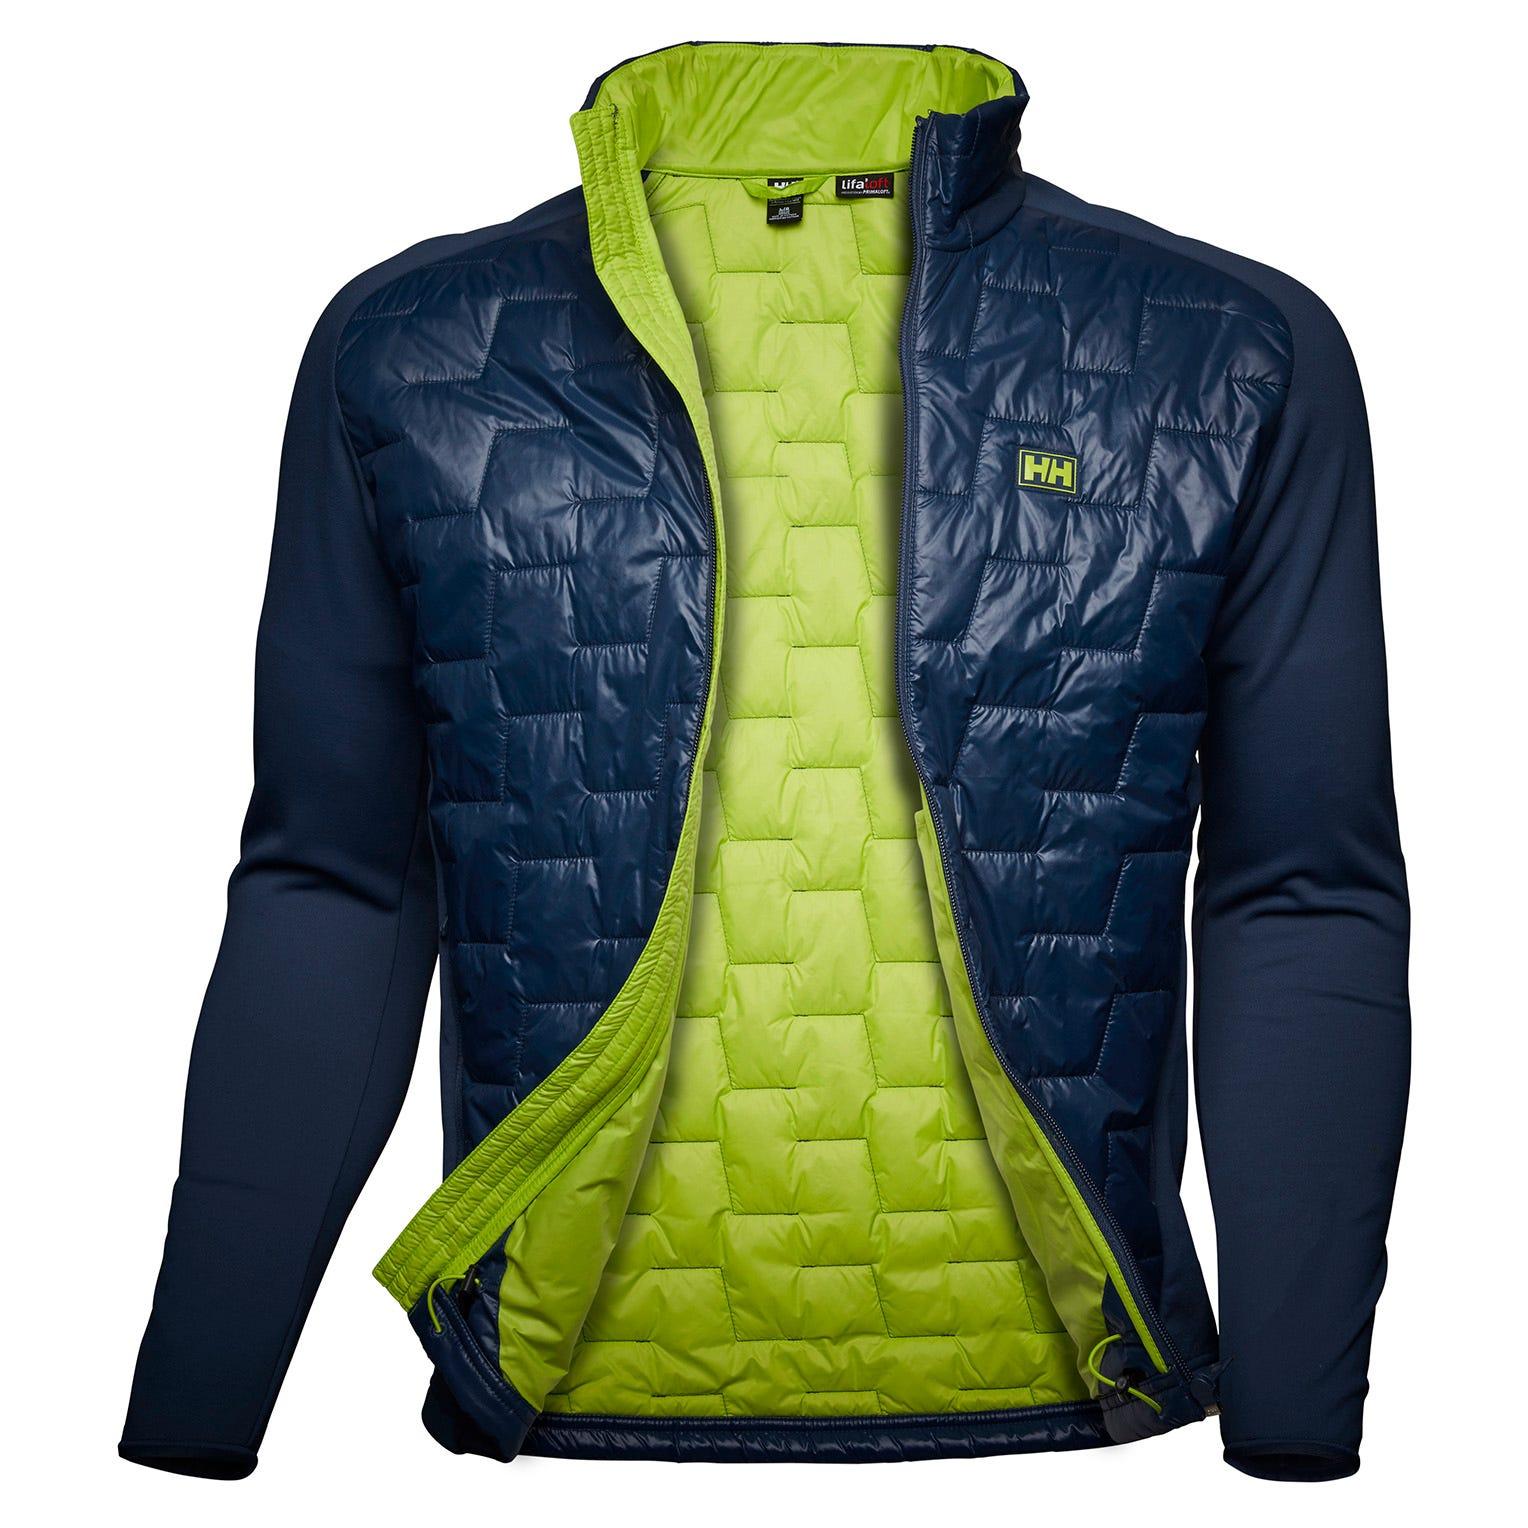 Helly Hansen Lifaloft Hybrid Insulator Jacket Mens Fleece Yellow XL